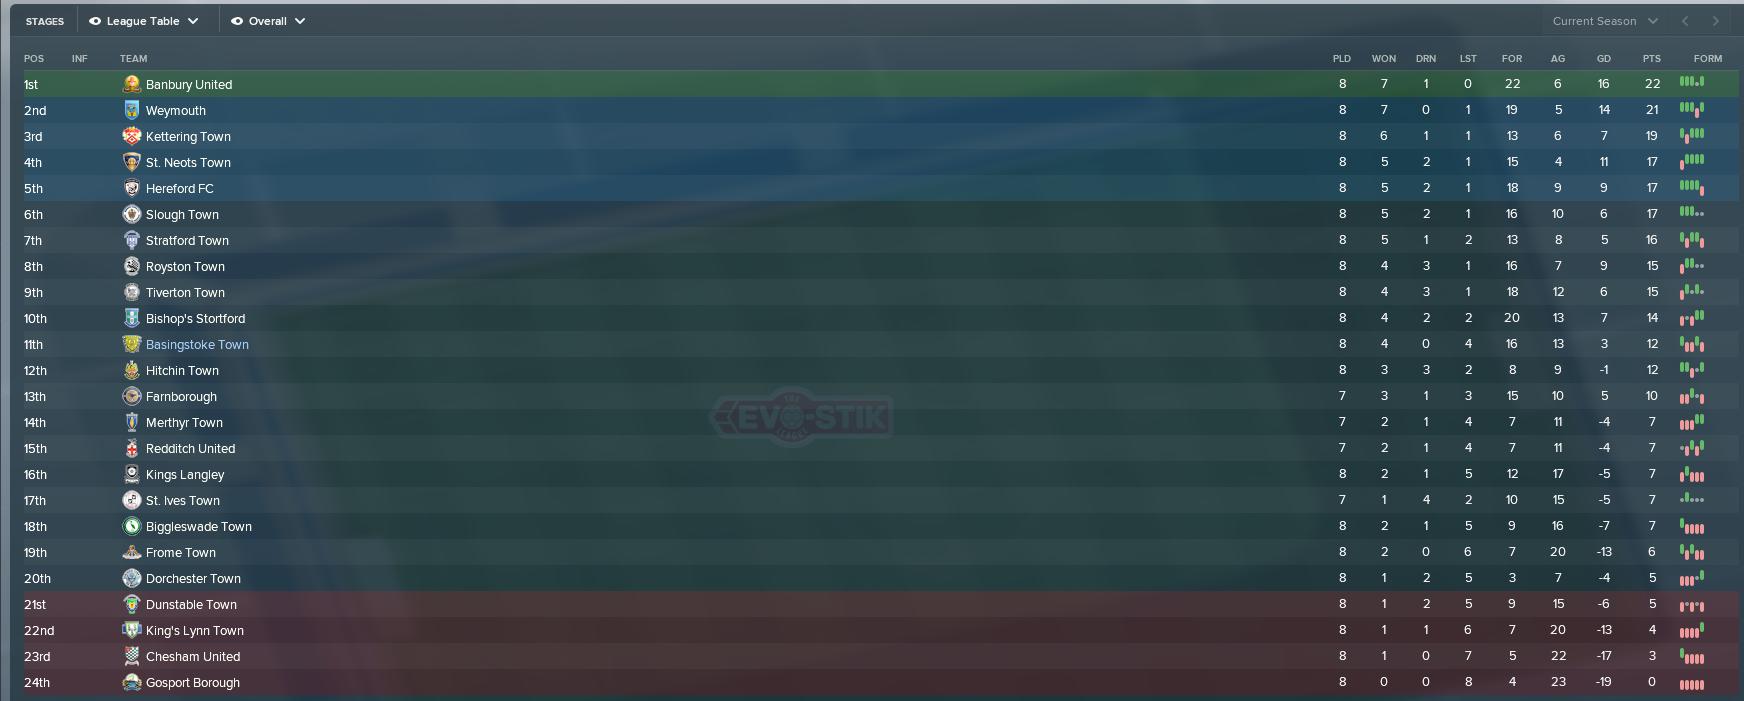 august_league_table.png